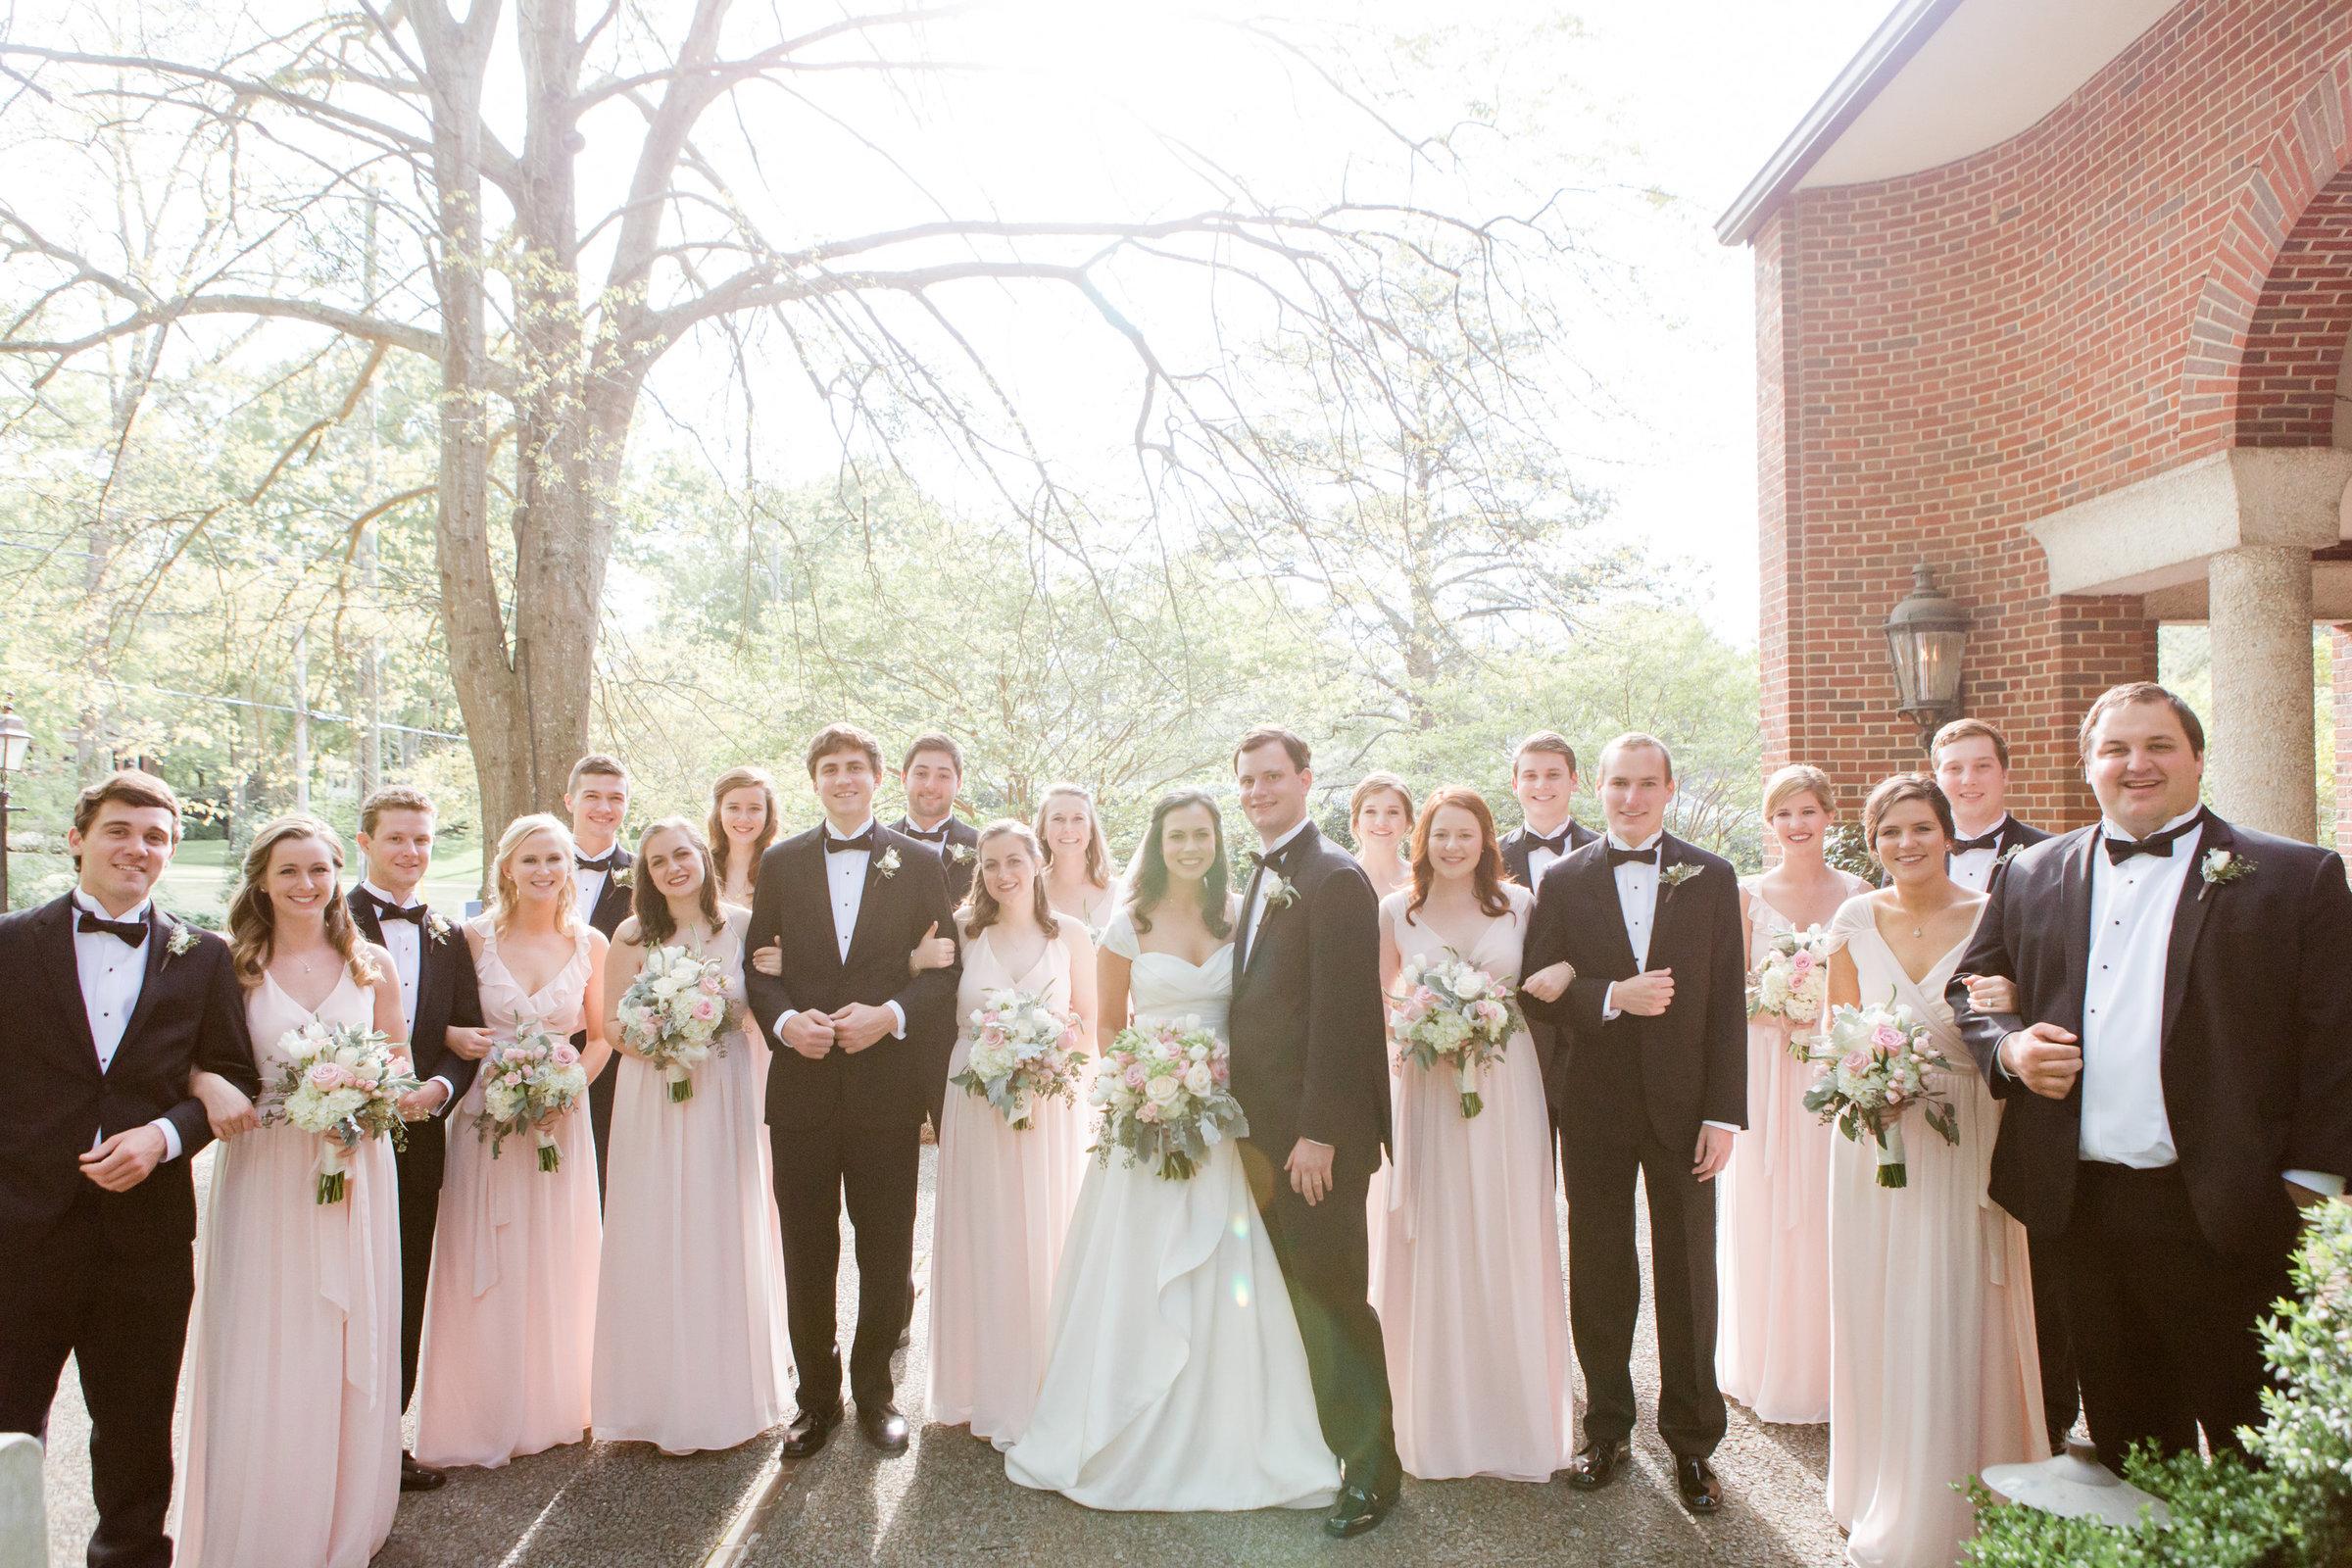 09_Wedding-Party_023